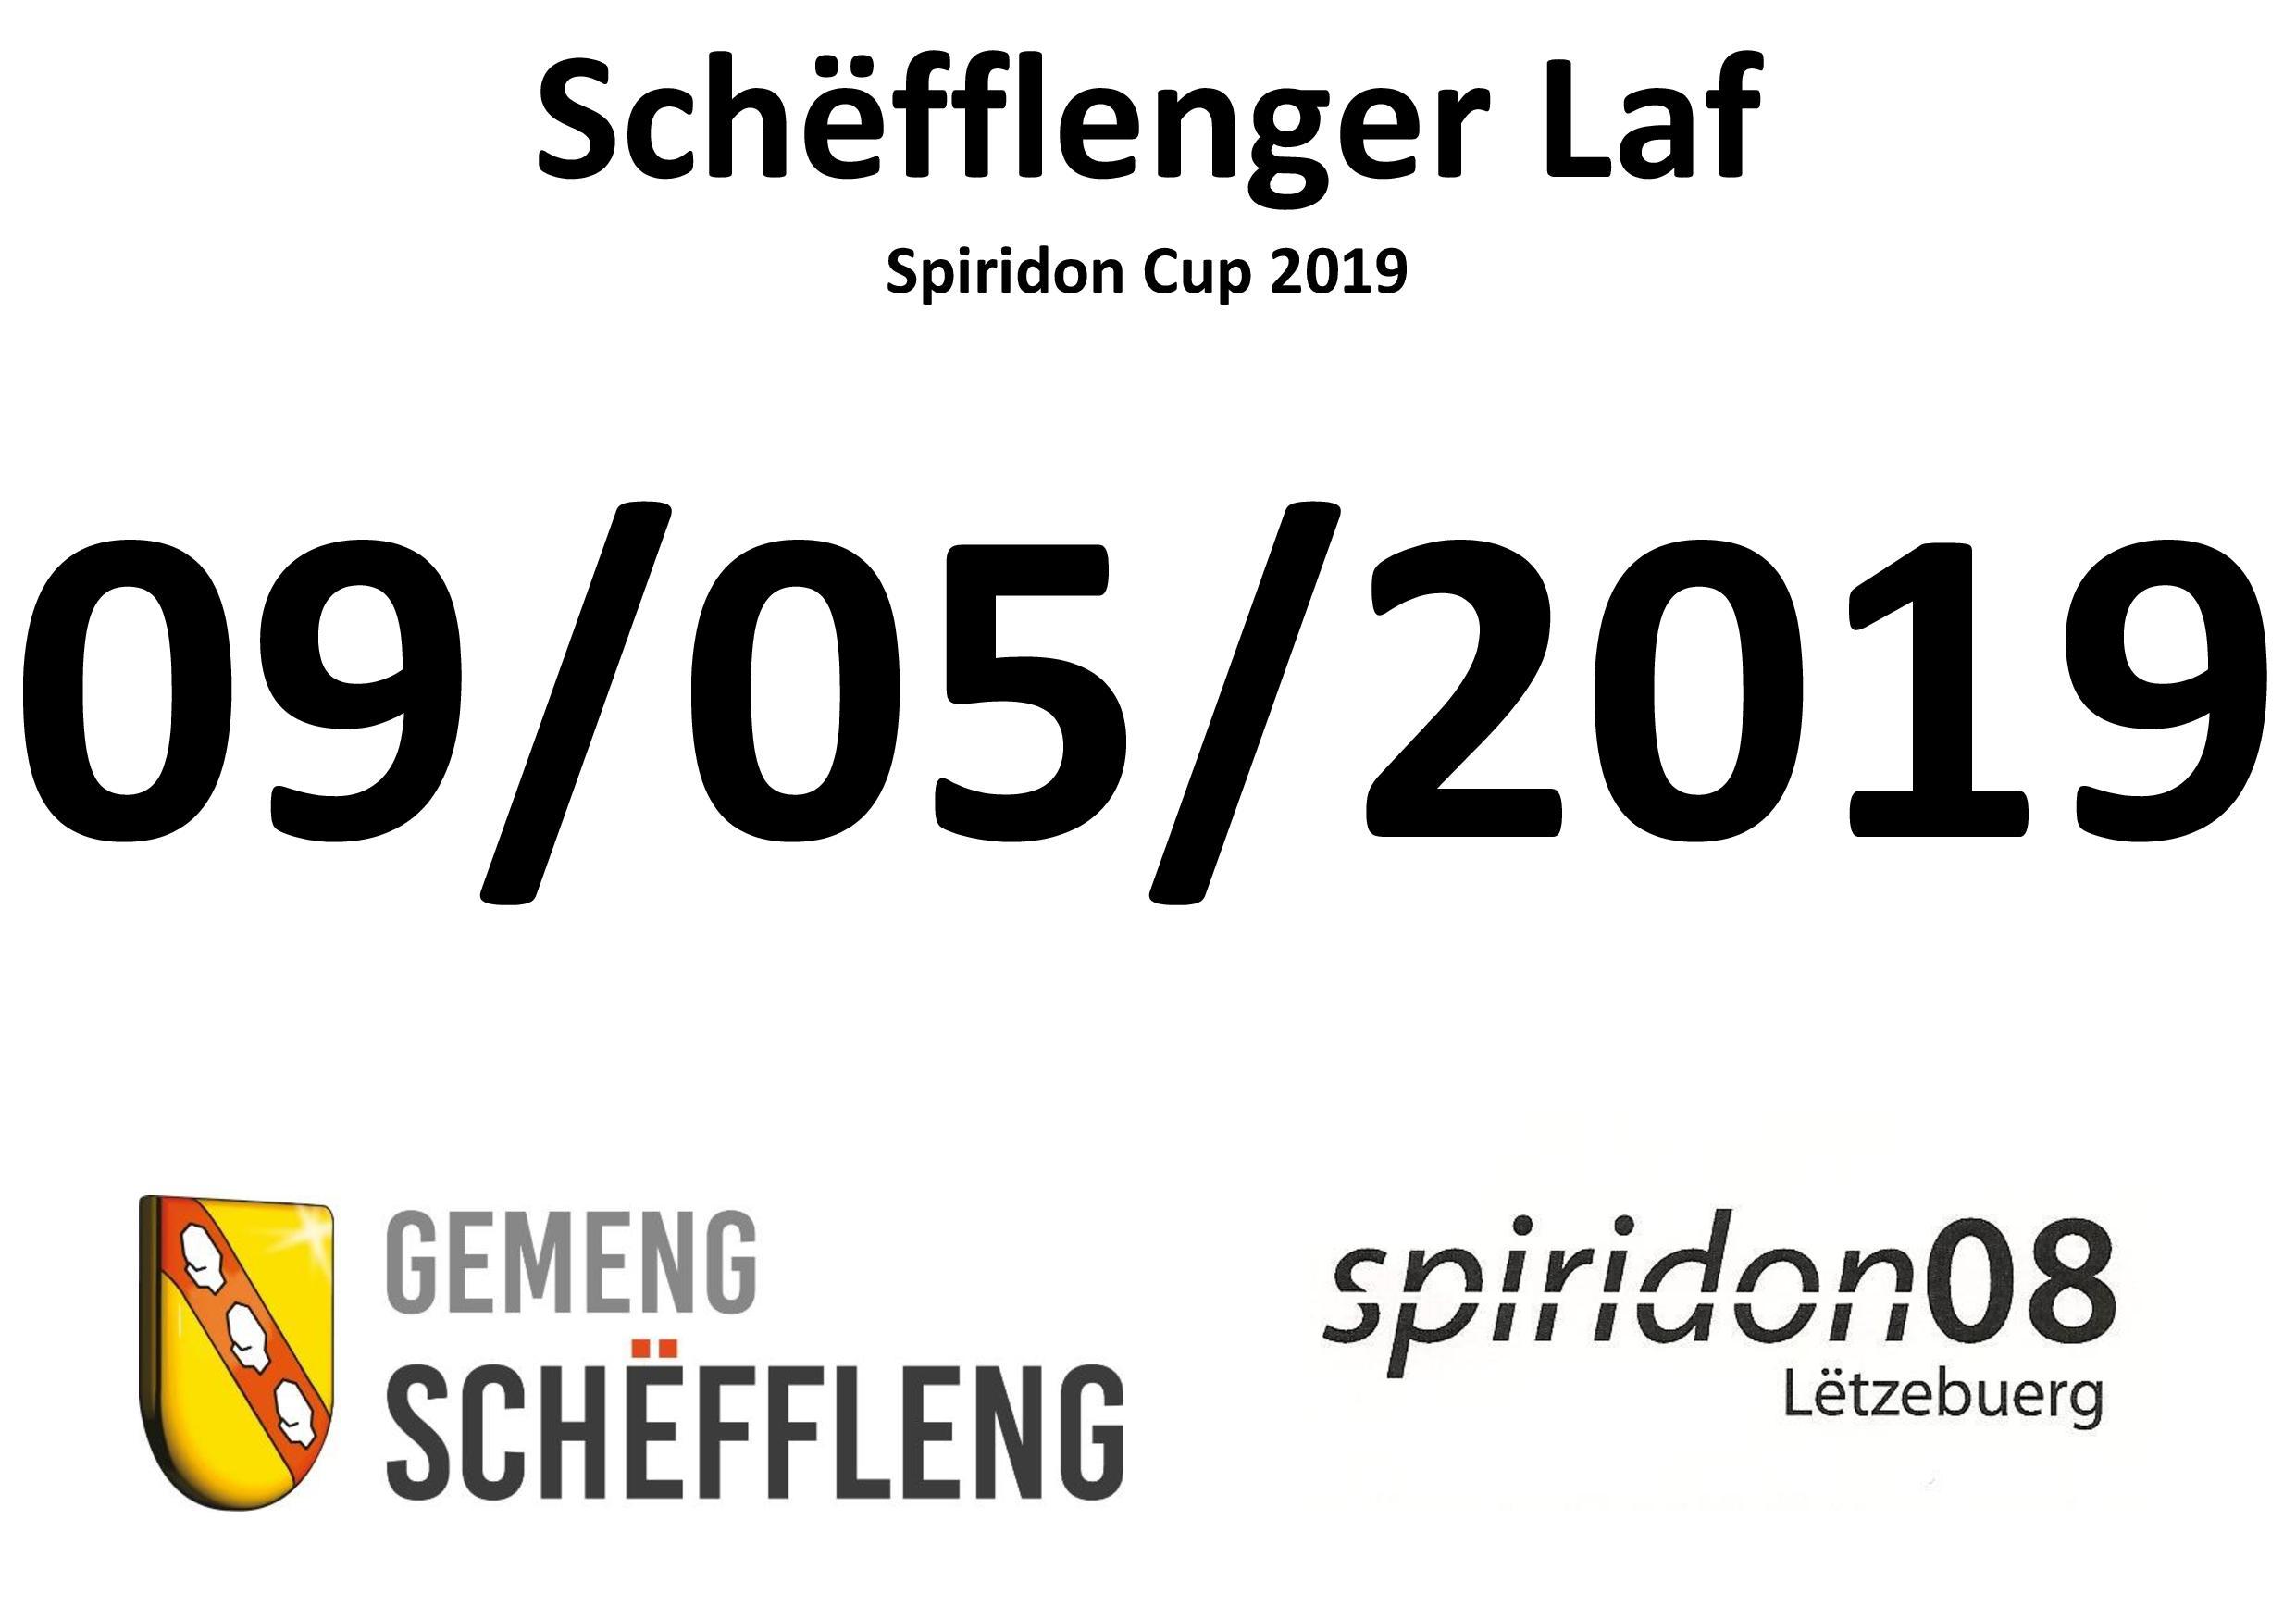 Information utiles - Schefflenger Laf